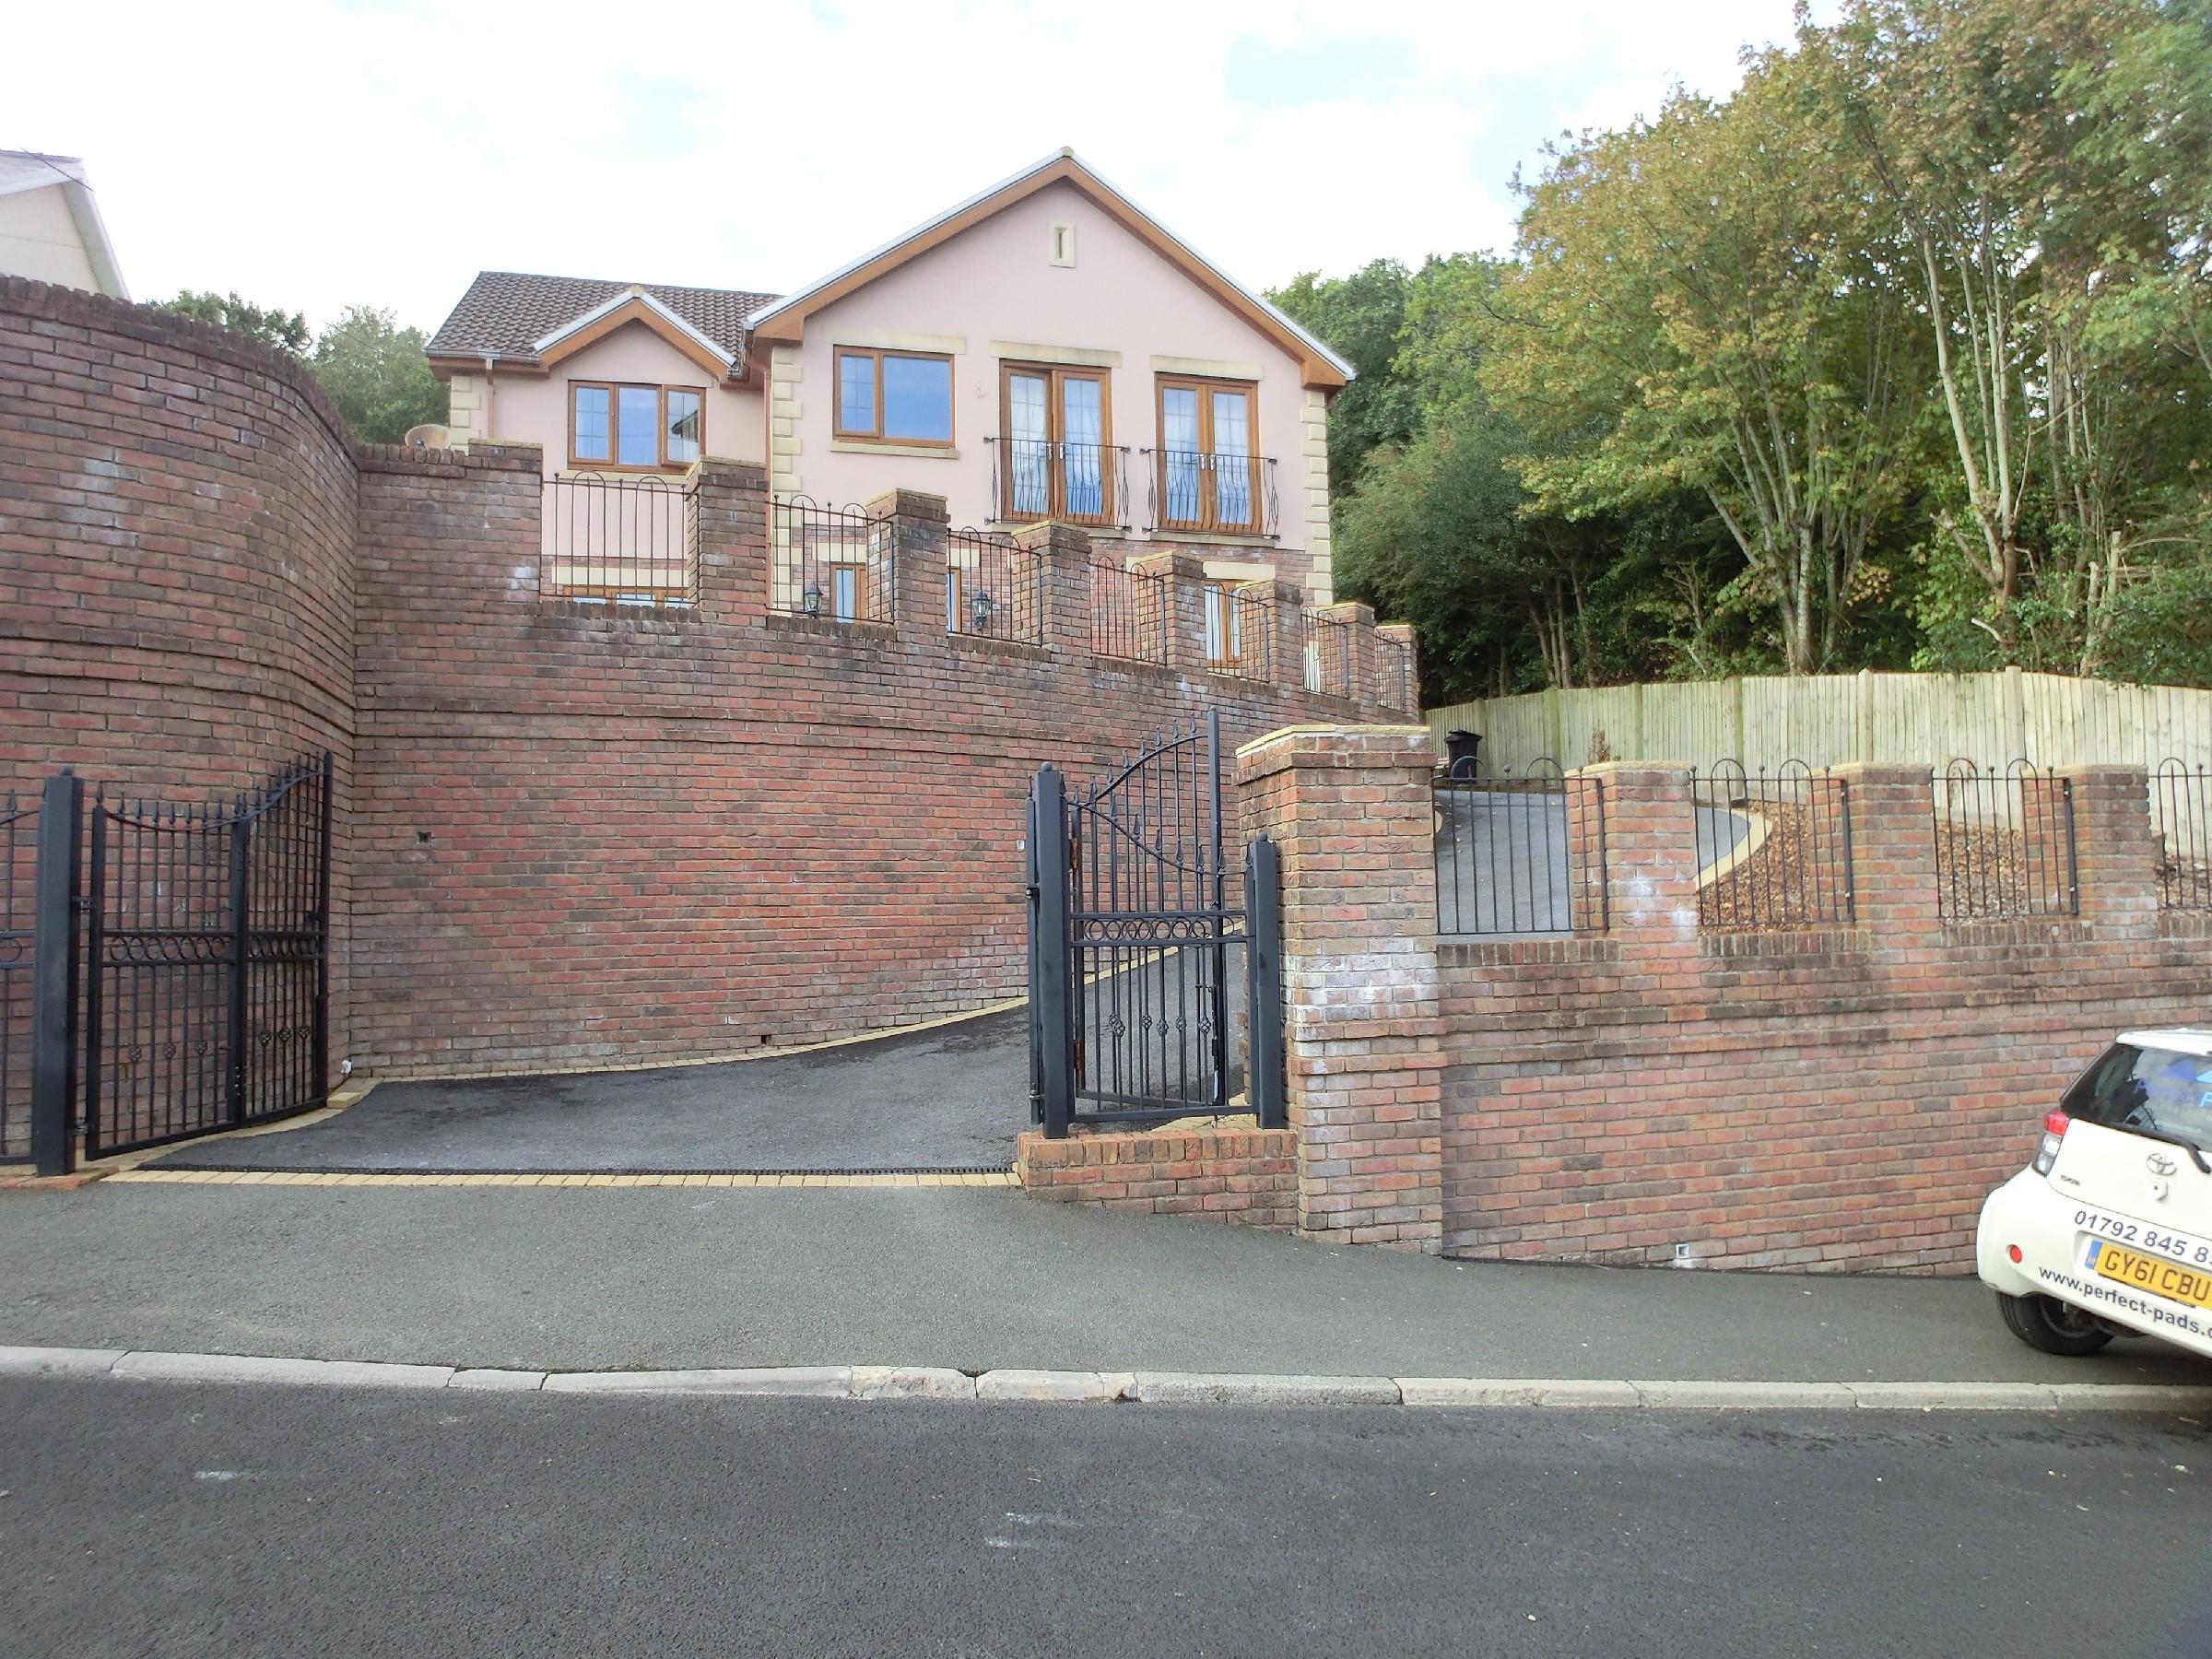 Bethesda Road, Ynysmeudwy, Pontardawe, Swansea